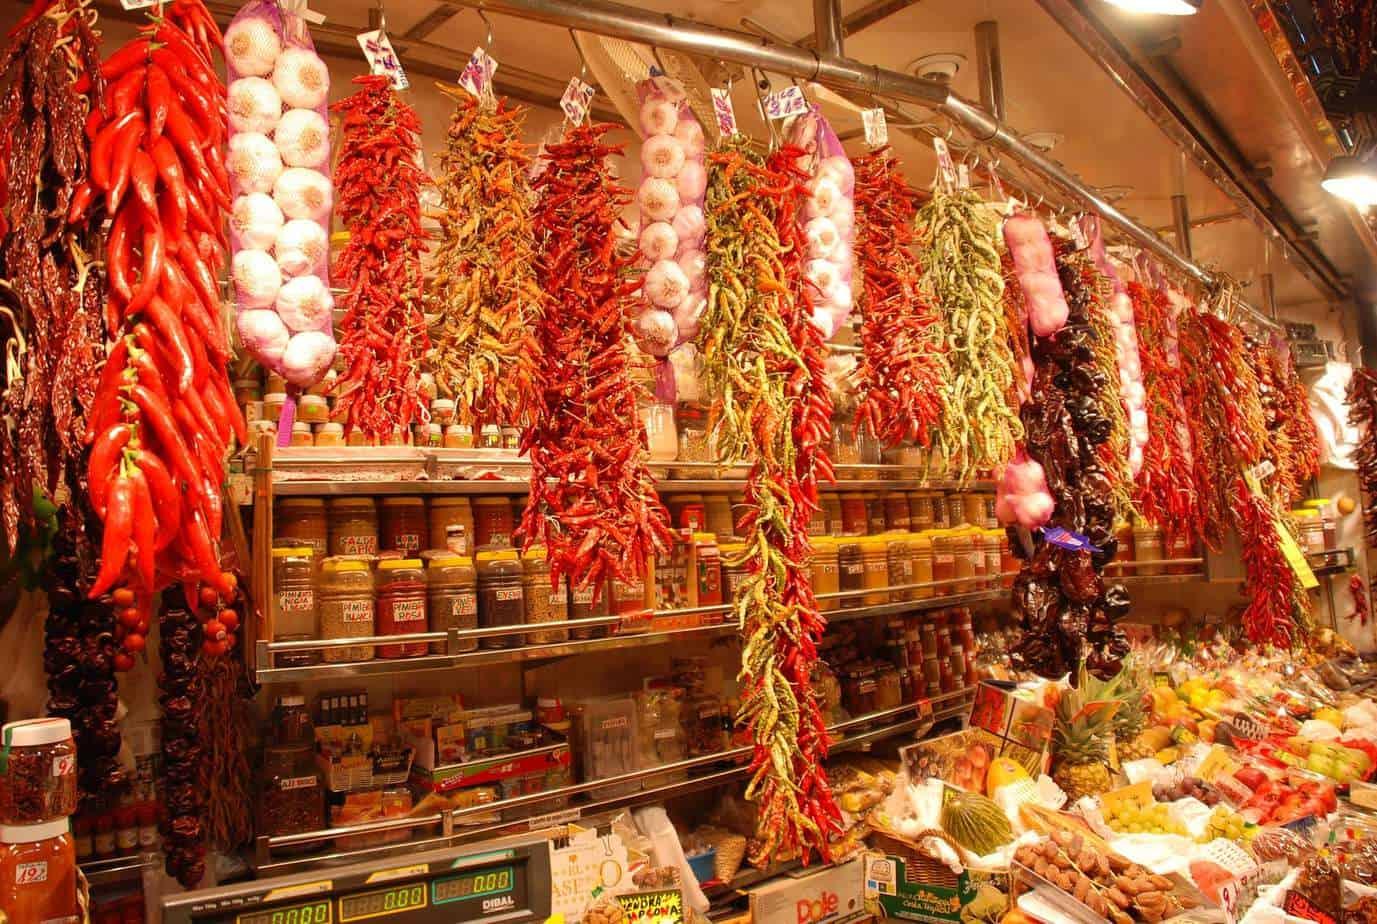 Mercado gastronómico de Barcelona